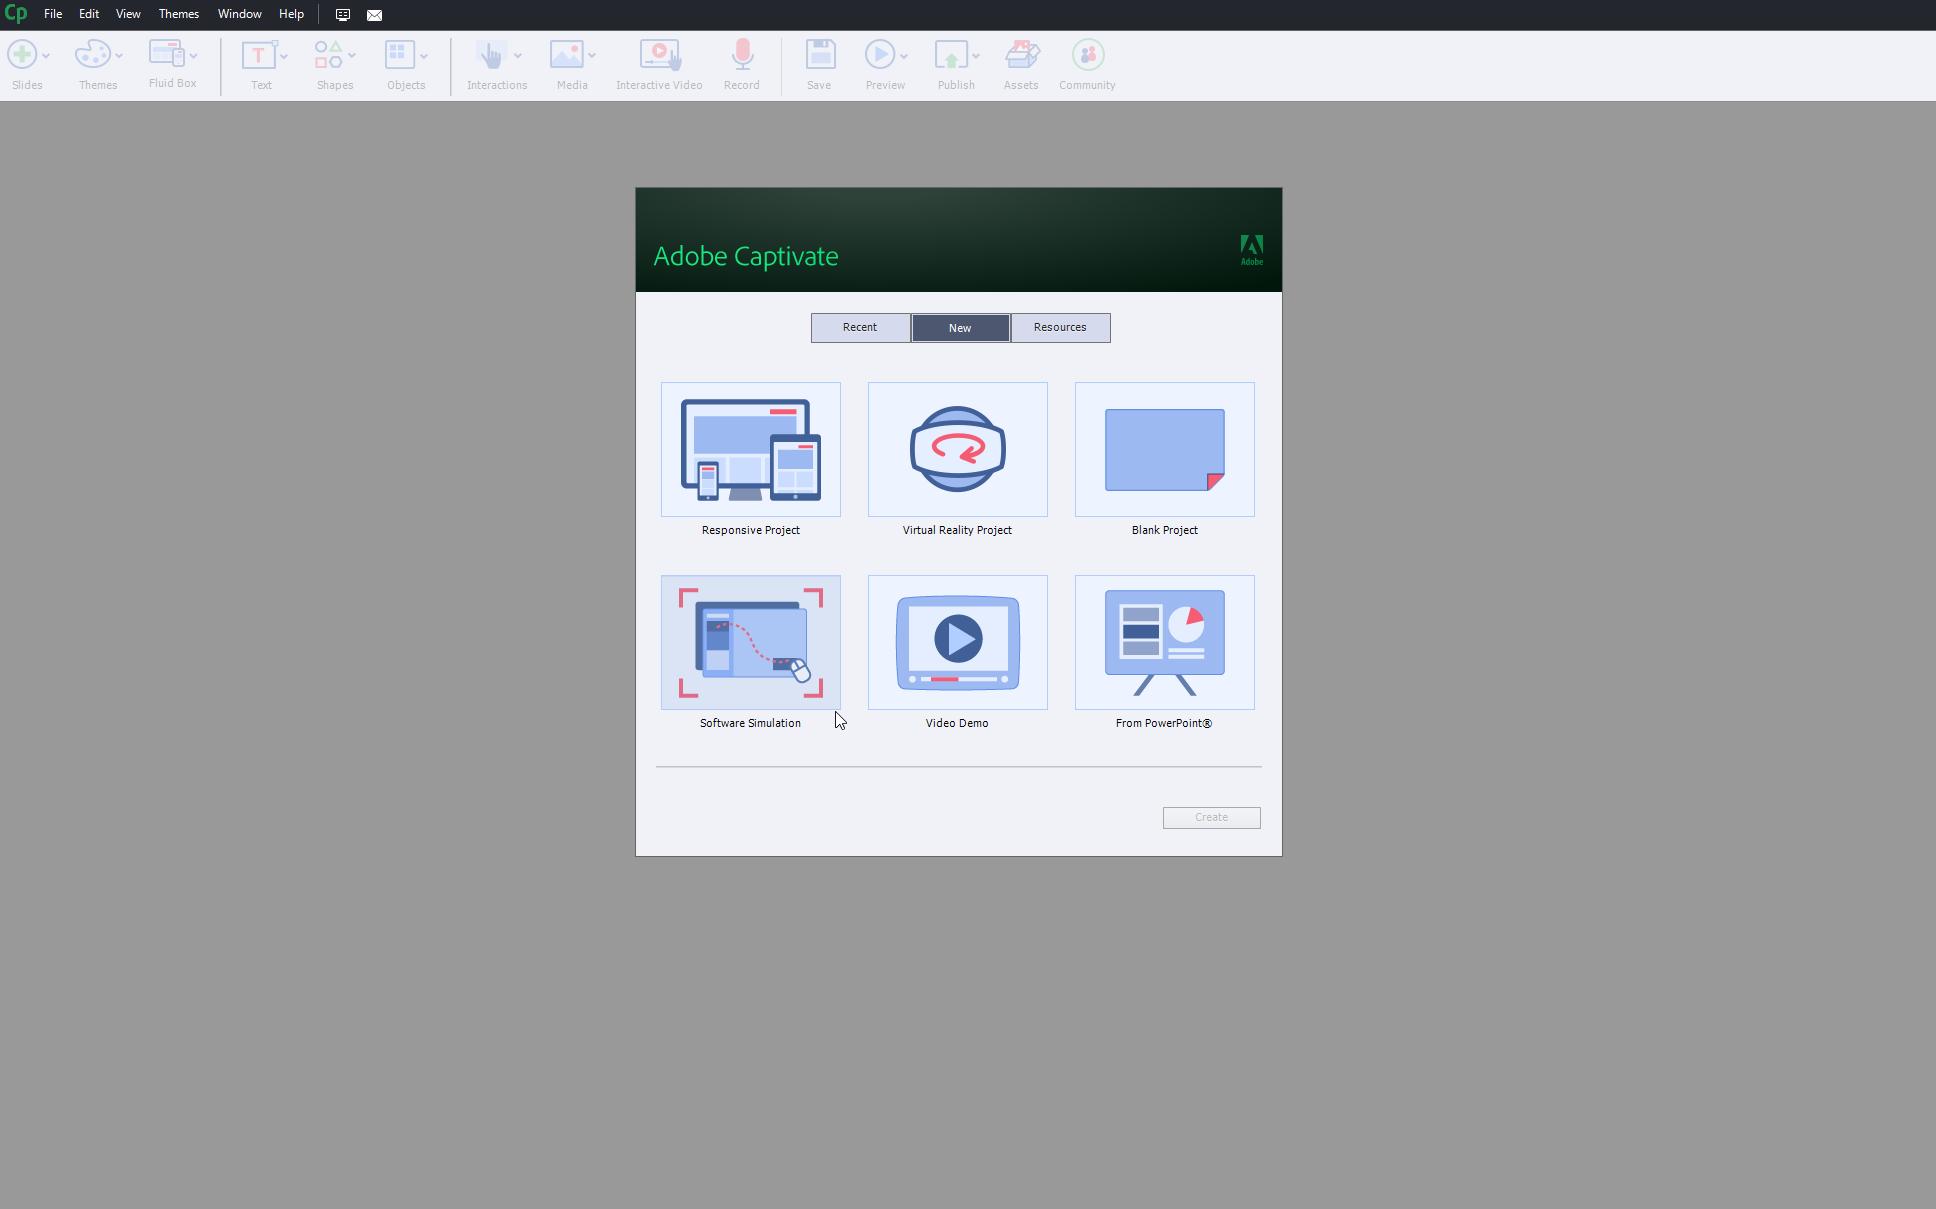 Screenshot der E-Learning Software Adobe Captivate